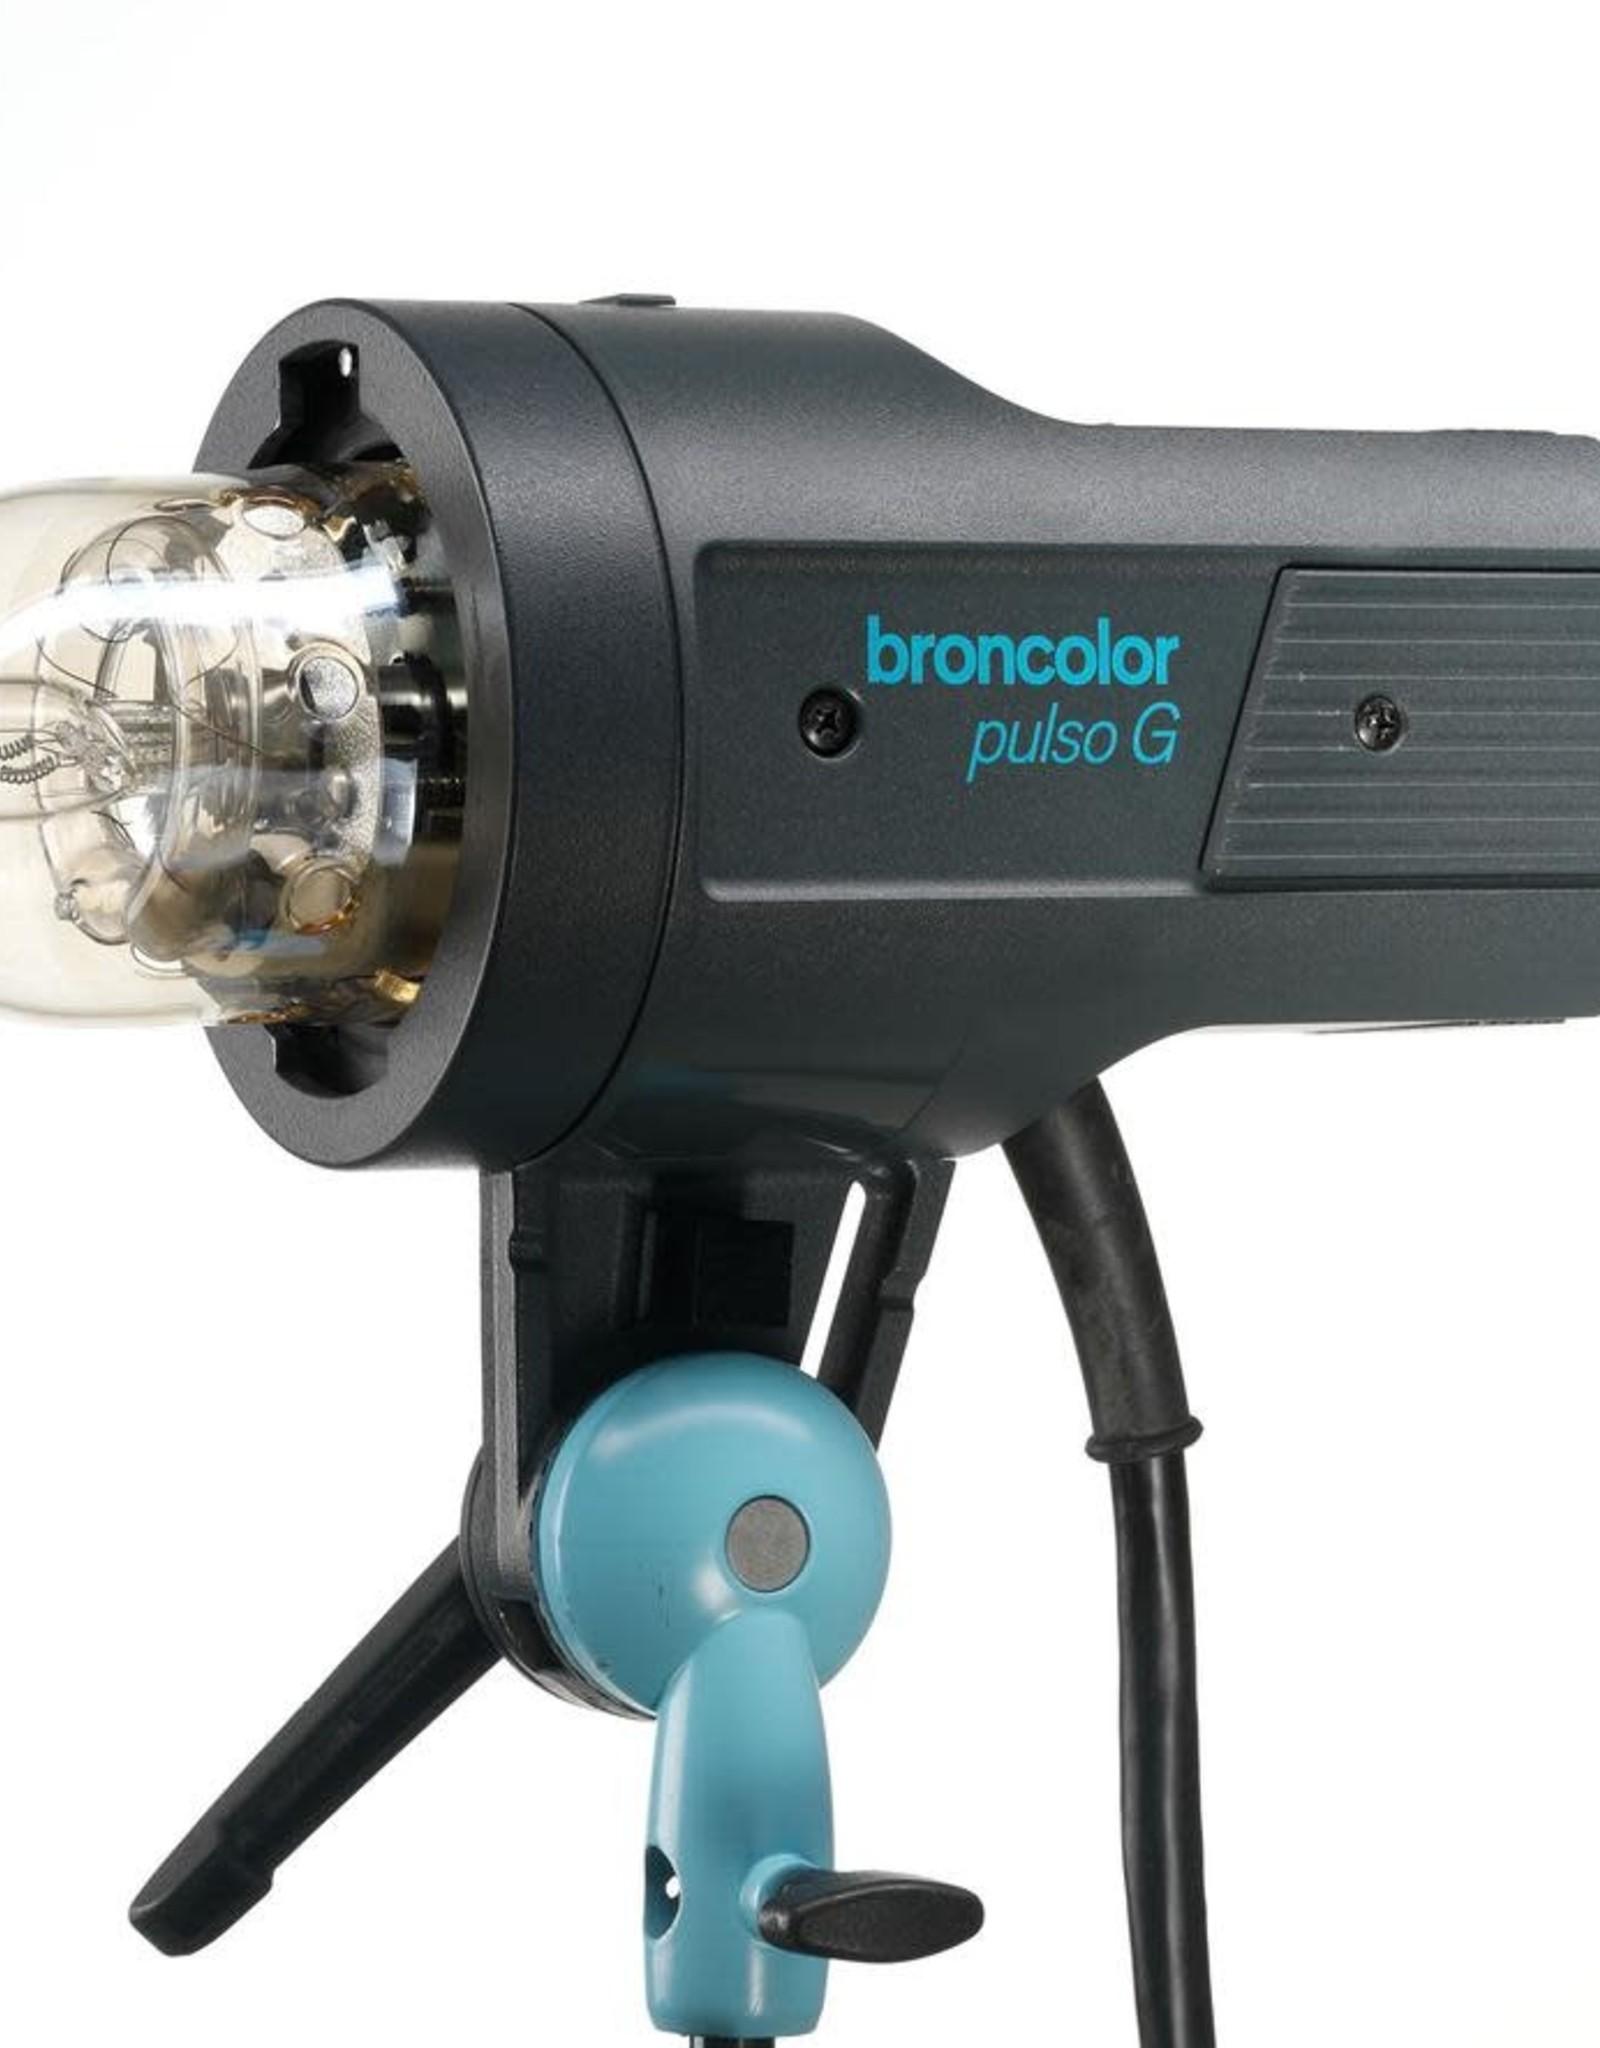 Broncolor Broncolor Pulso G 3200J 120v/300w